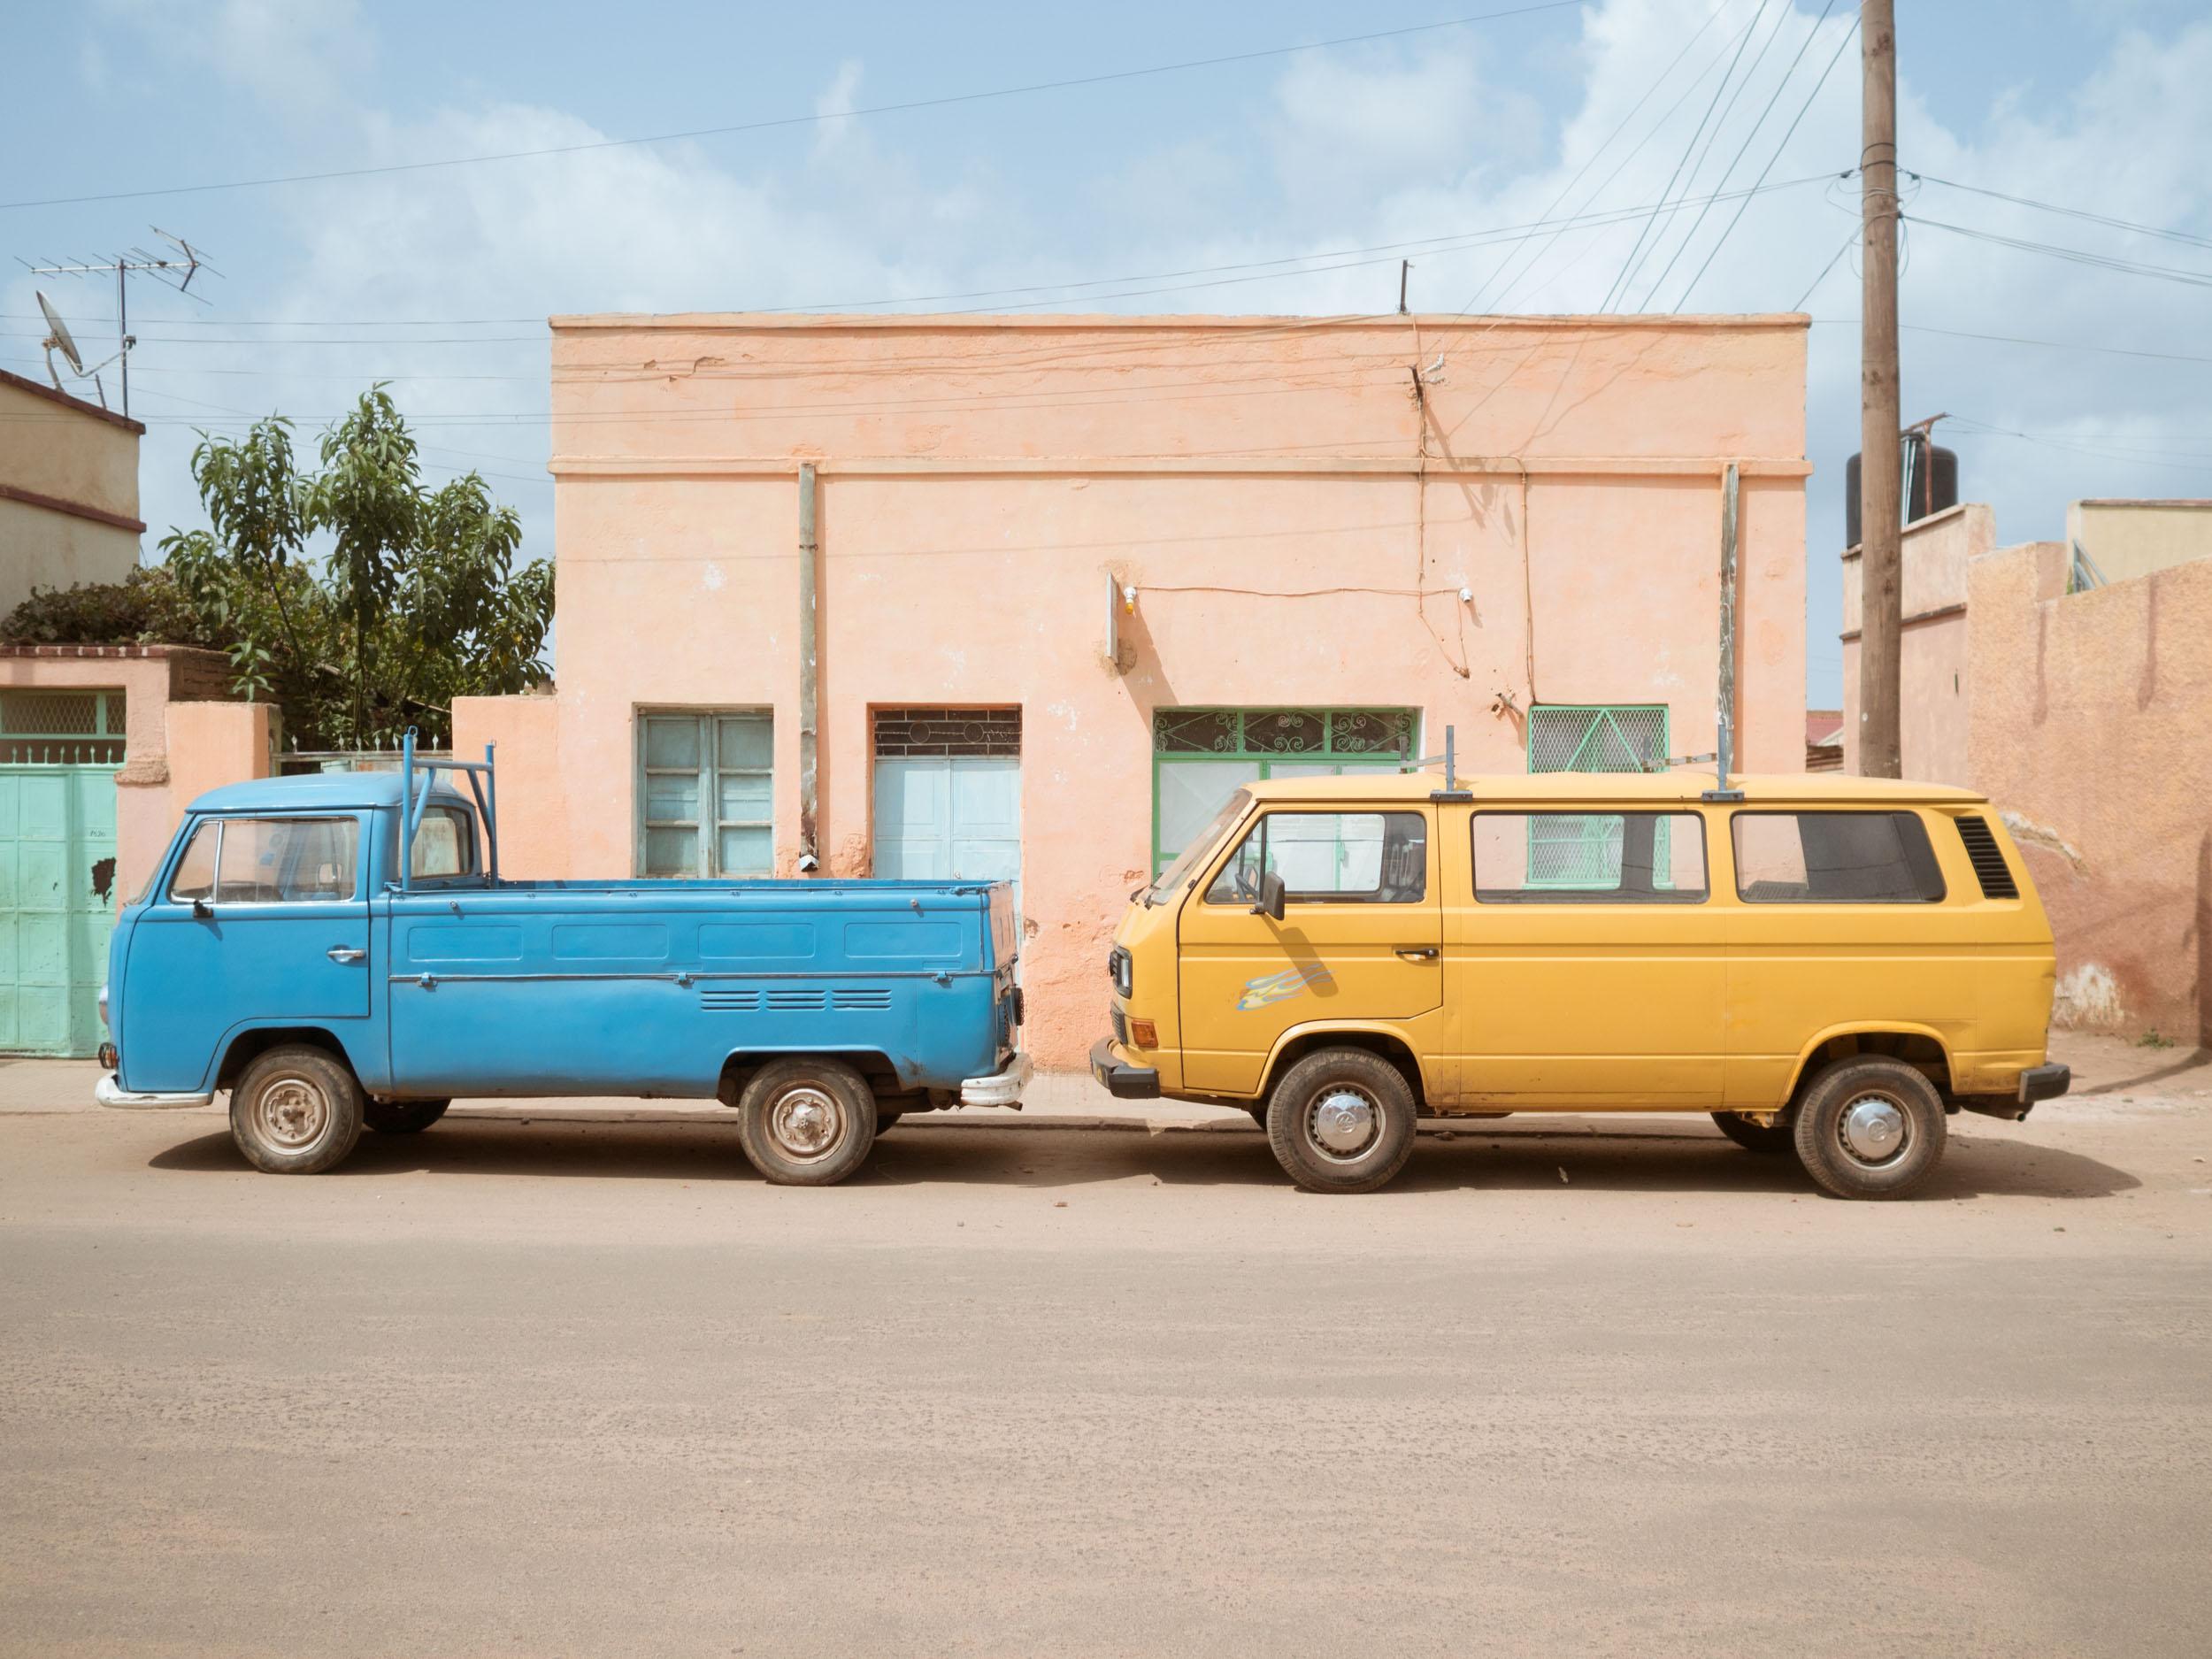 VW vans in the streets of Asmara, Eritrea.